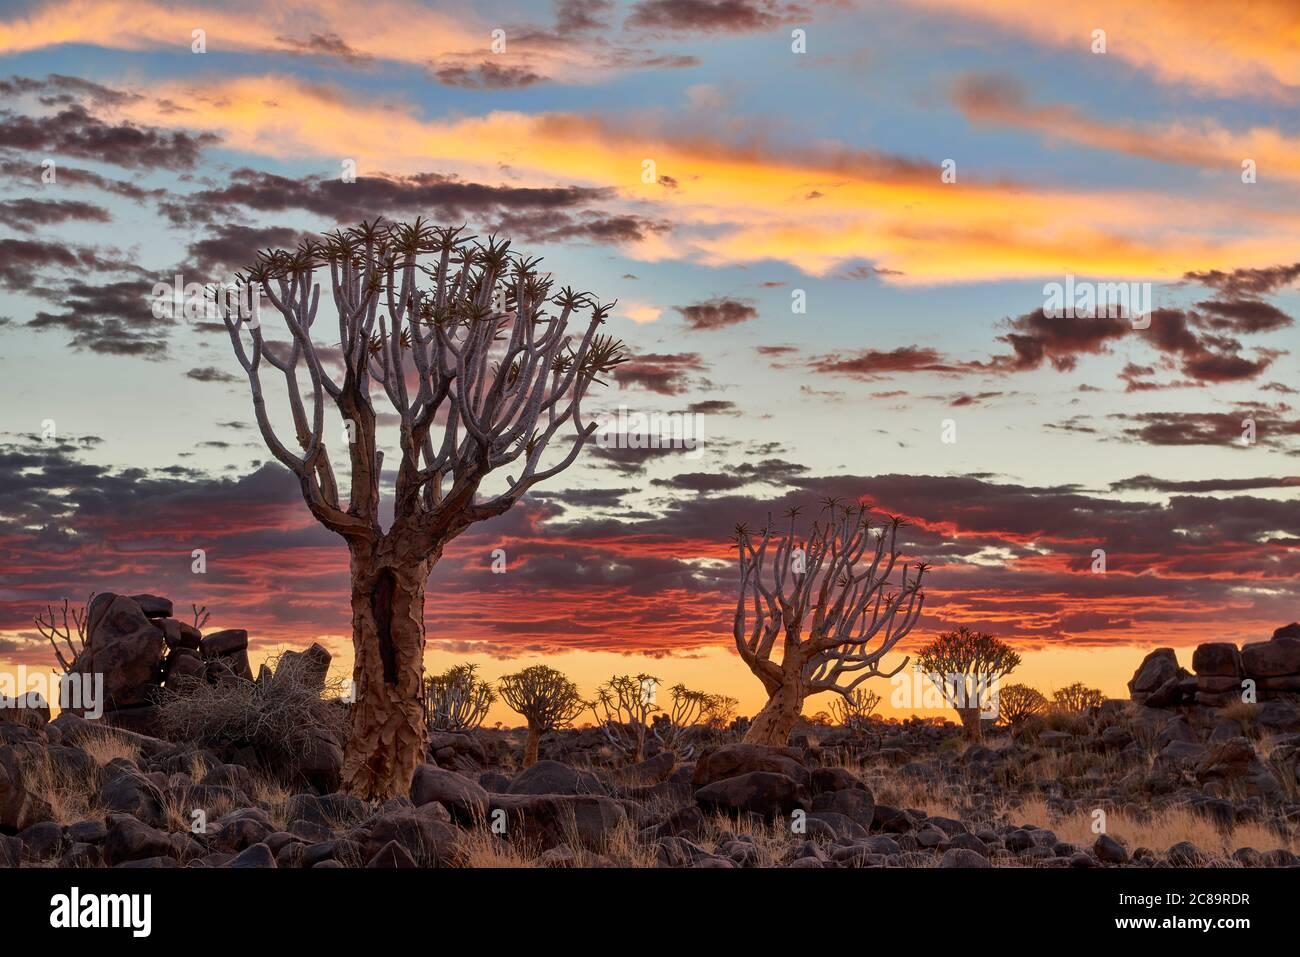 Sonnenuntergang im Köcherbaumwald, Aloe dichotoma, Bauernhof Garas, mesosaurus Fossil Site, Keetmanshoop, Namibia, Afrika Stockfoto